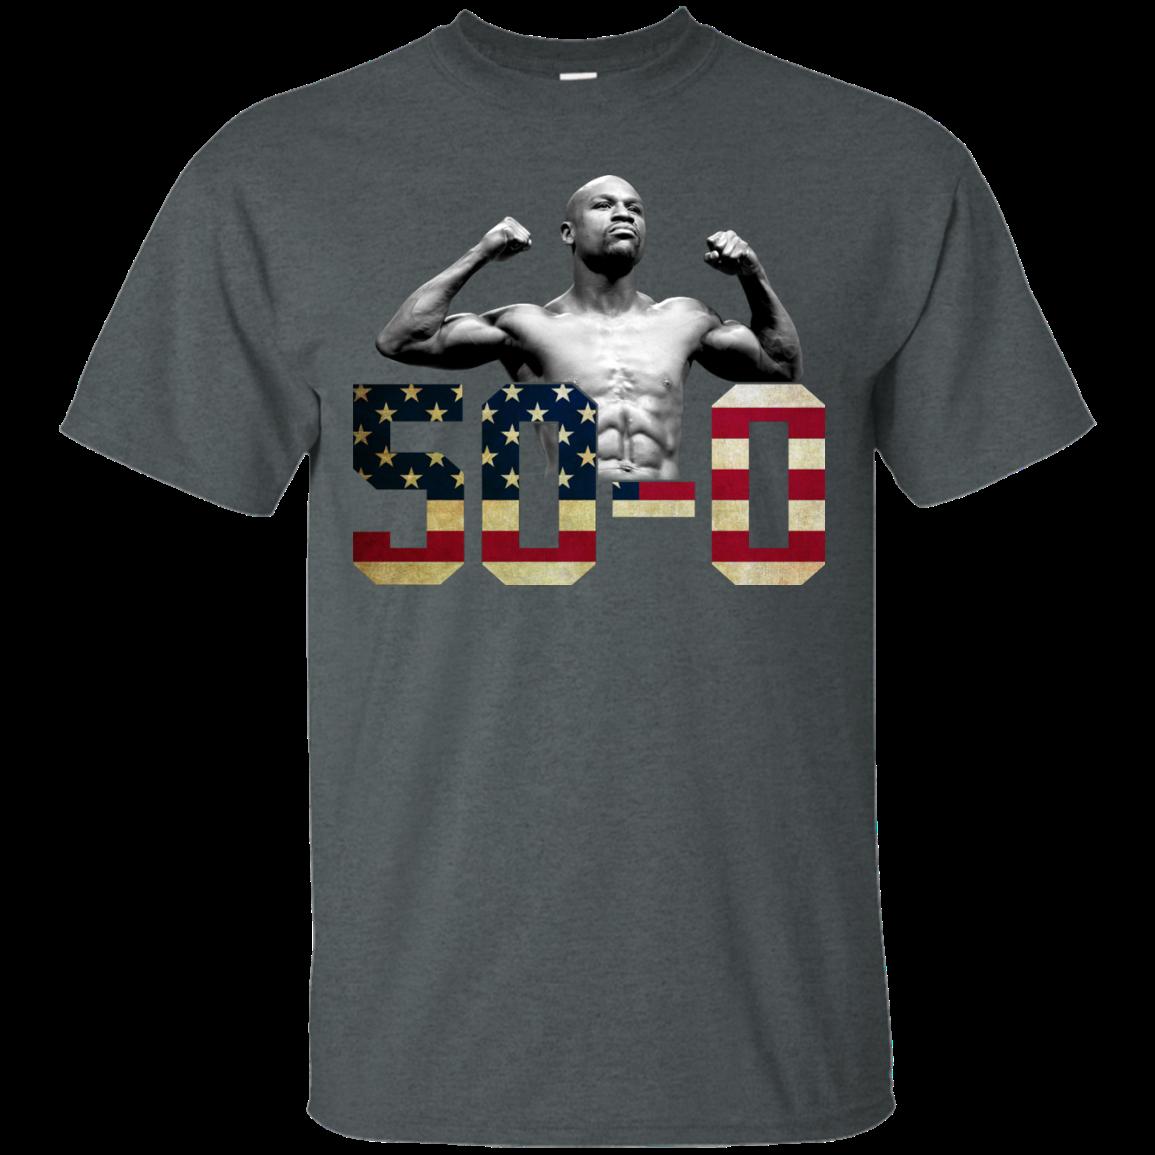 image 504px Floyd Mayweather 50 0 Shirt, Hoodies, Tank